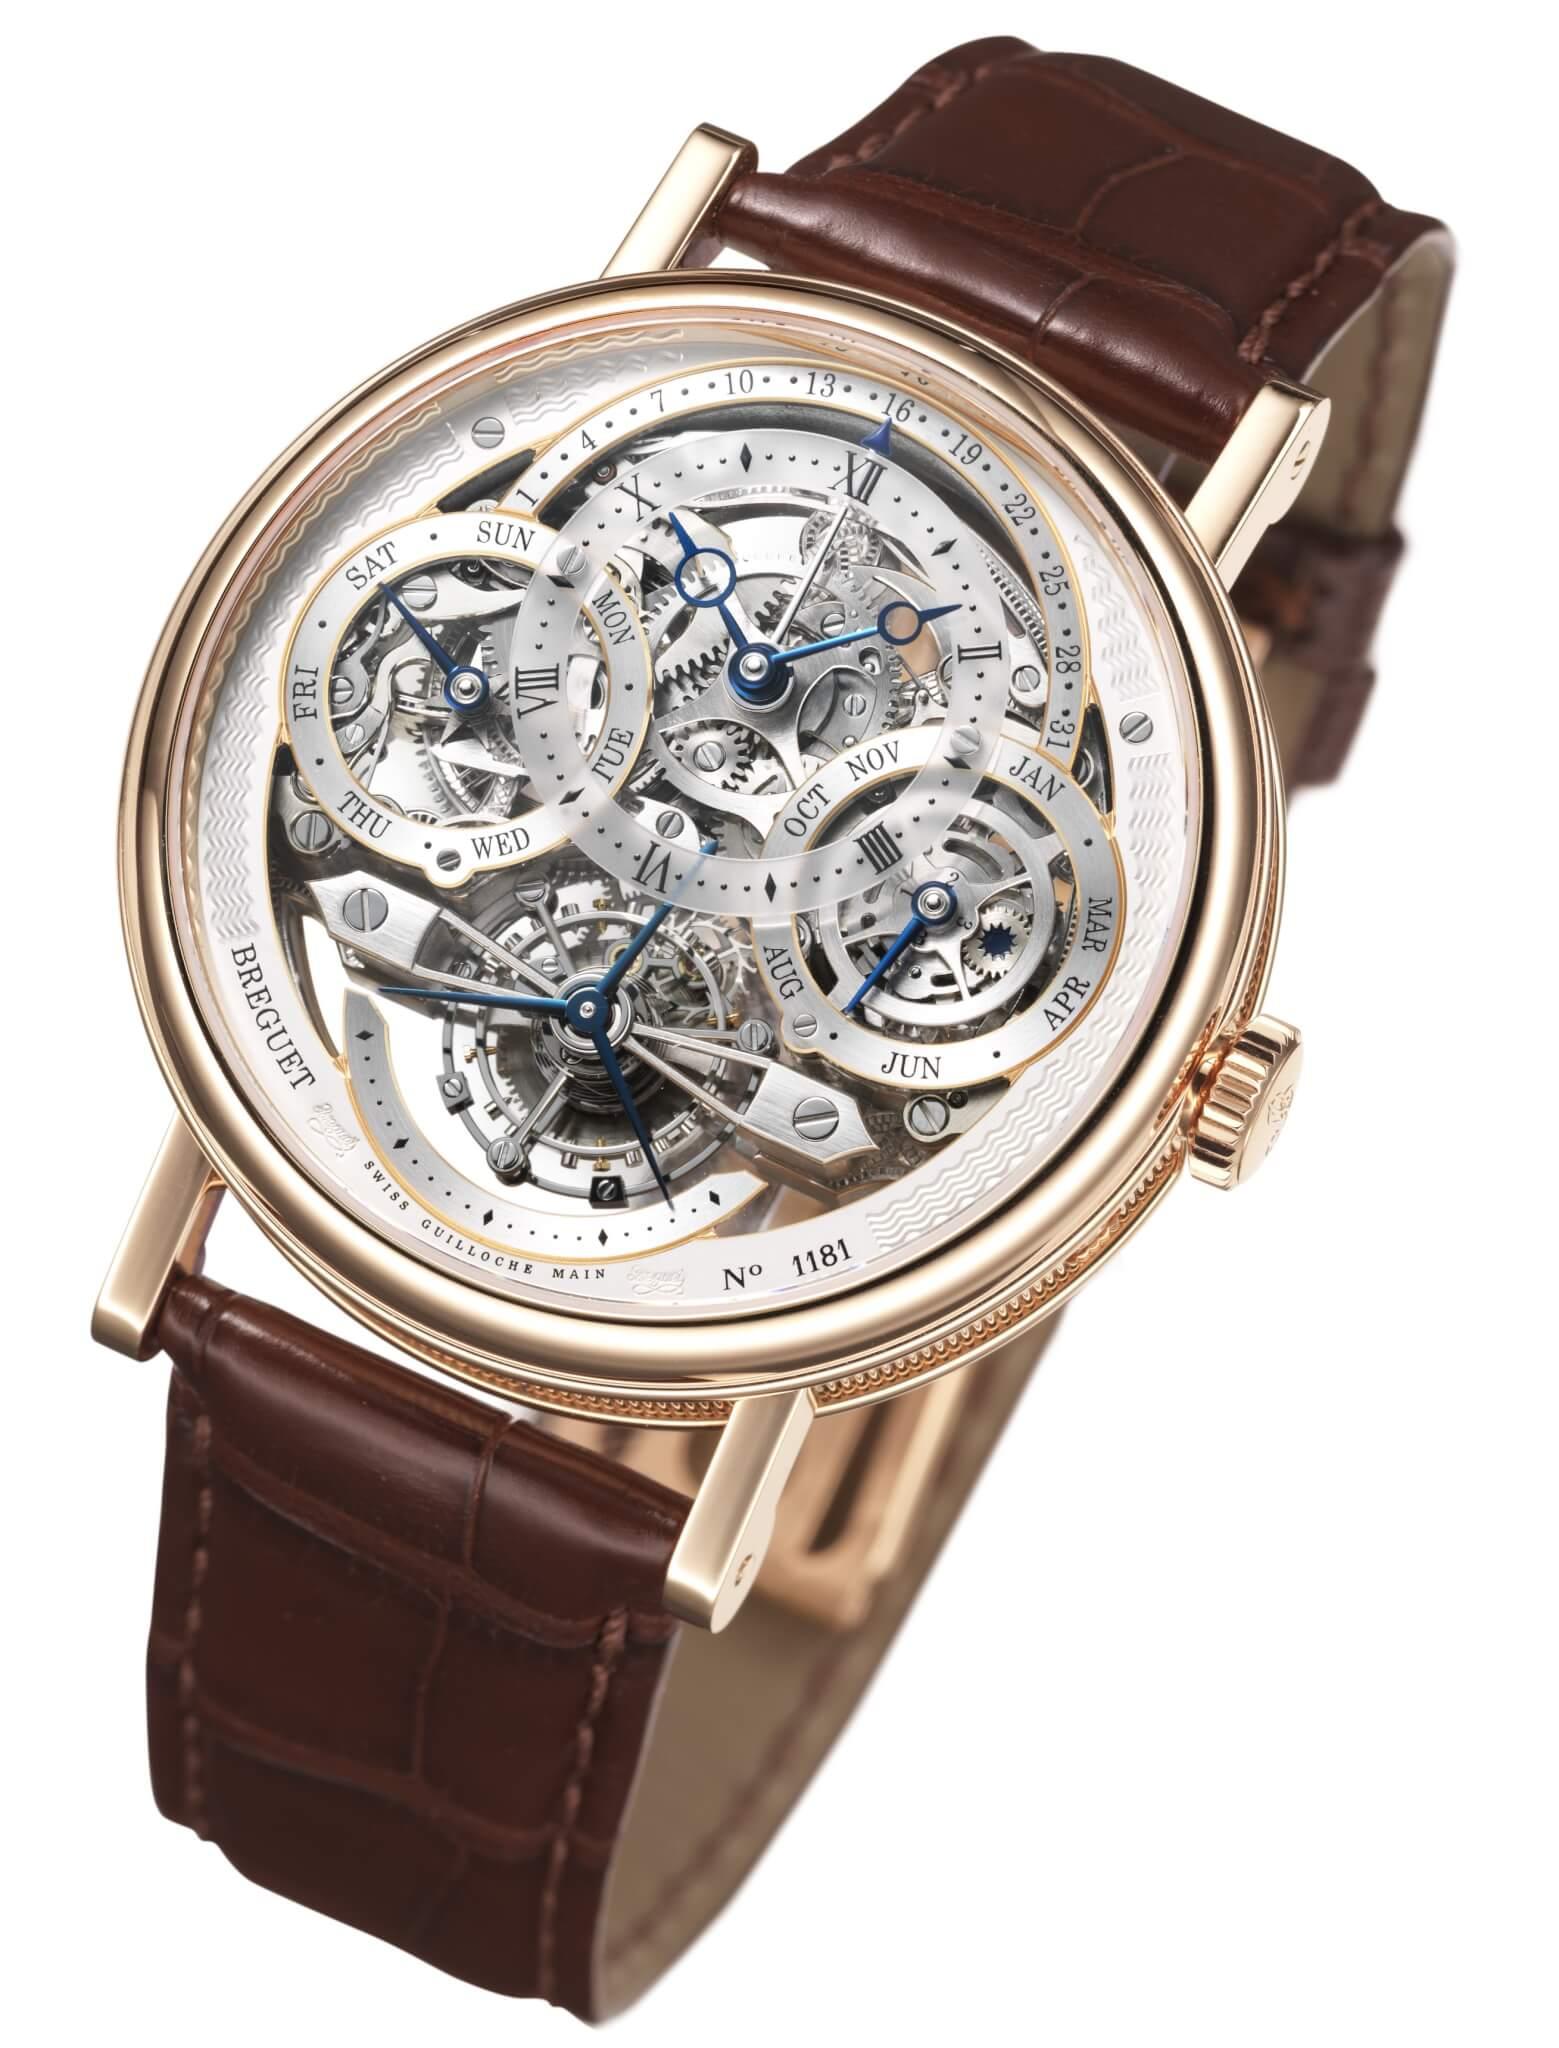 promo code 693da 18061 世界5大時計ブランド、ブレゲ(Breguet)の魅力と定番モデルを紹介